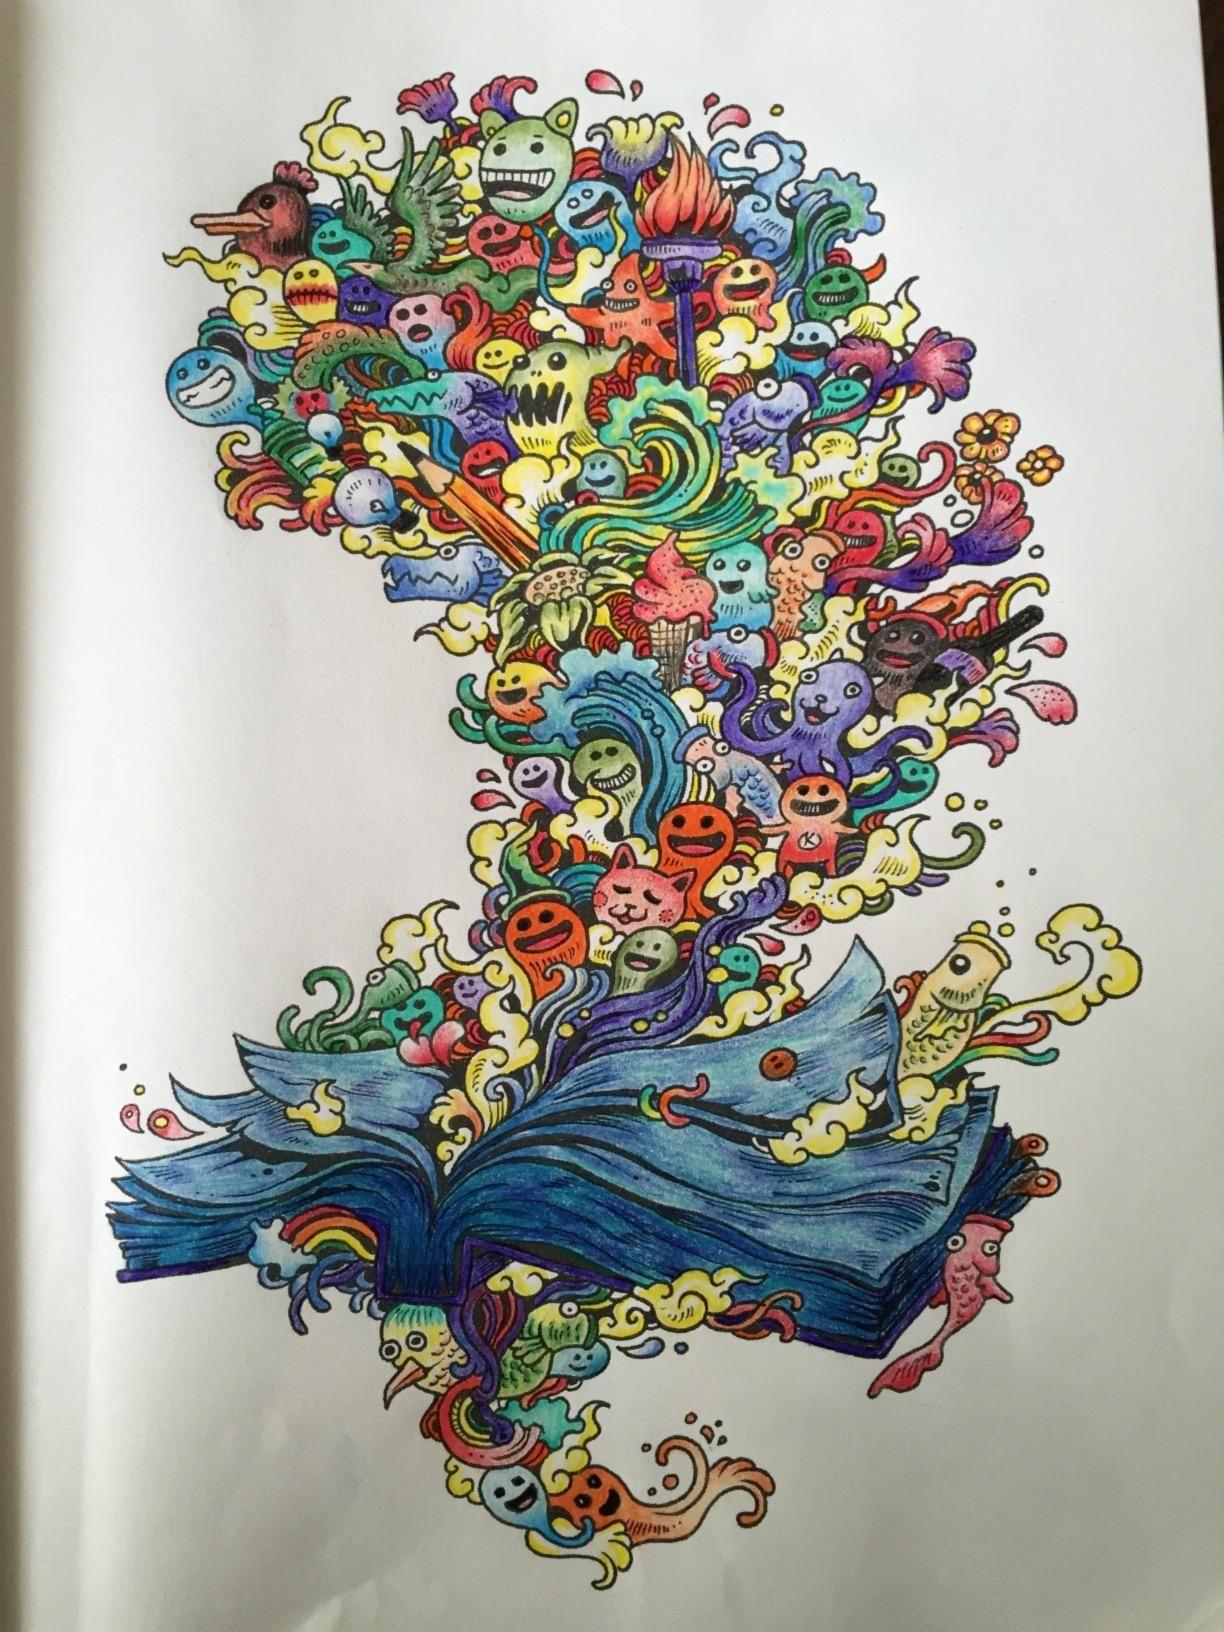 Doodle Invasion Zifflin S Coloring Book Zifflin Kerby Rosanes 9781492977056 Amazon Com Books Coloring Book Art Coloring Books Doodle Coloring